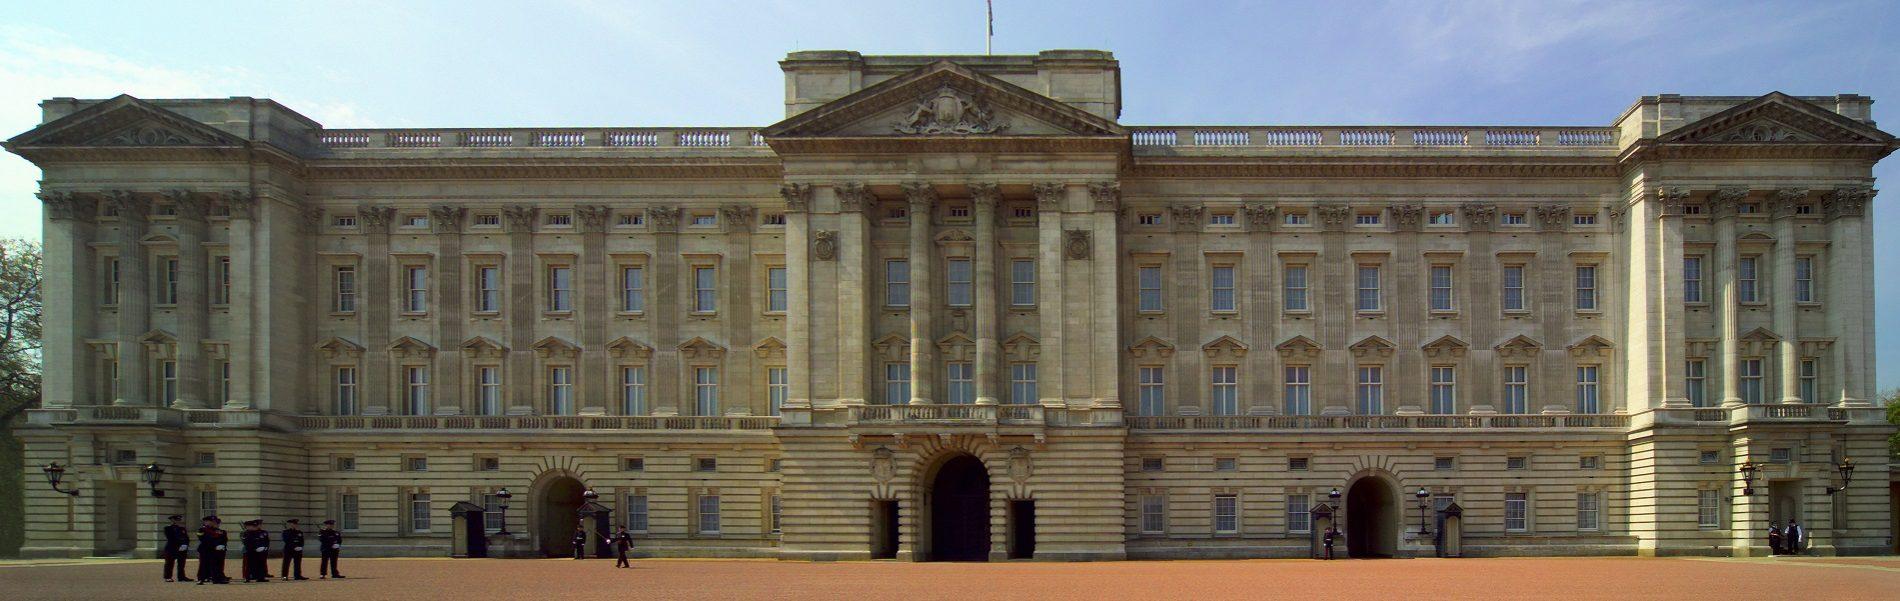 Tours of London - Buckingham Palace